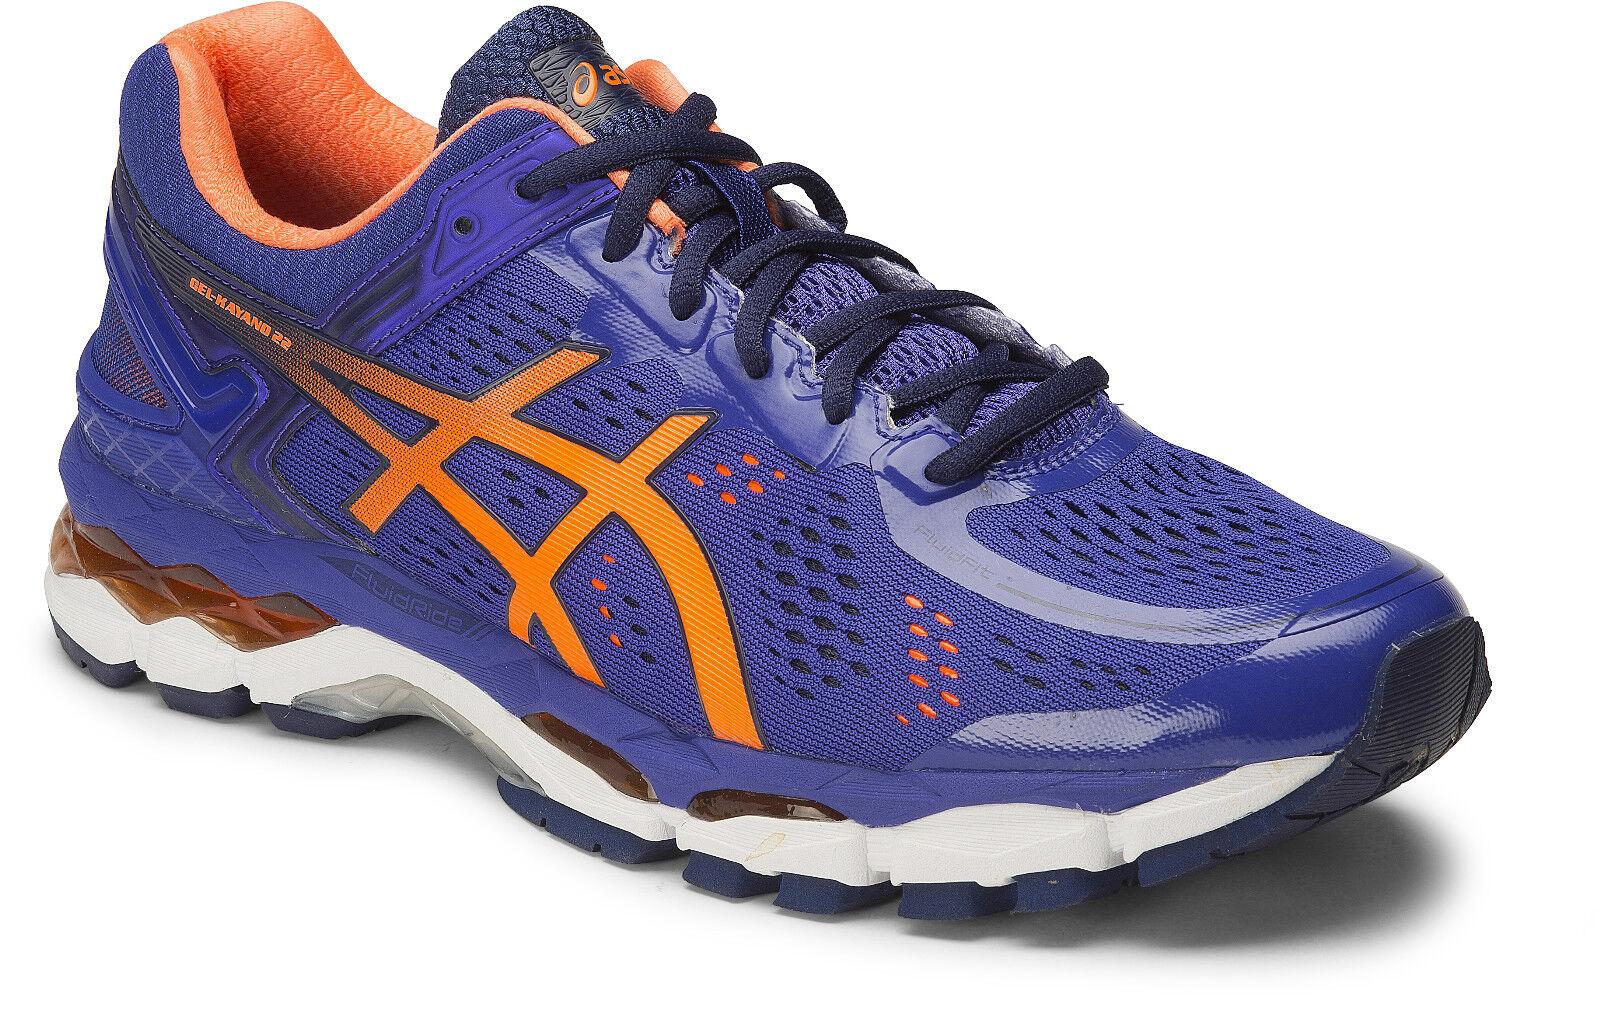 * NEW * Asics Gel Kayano 22 Mens Flexible Running Shoe (D) (4330)